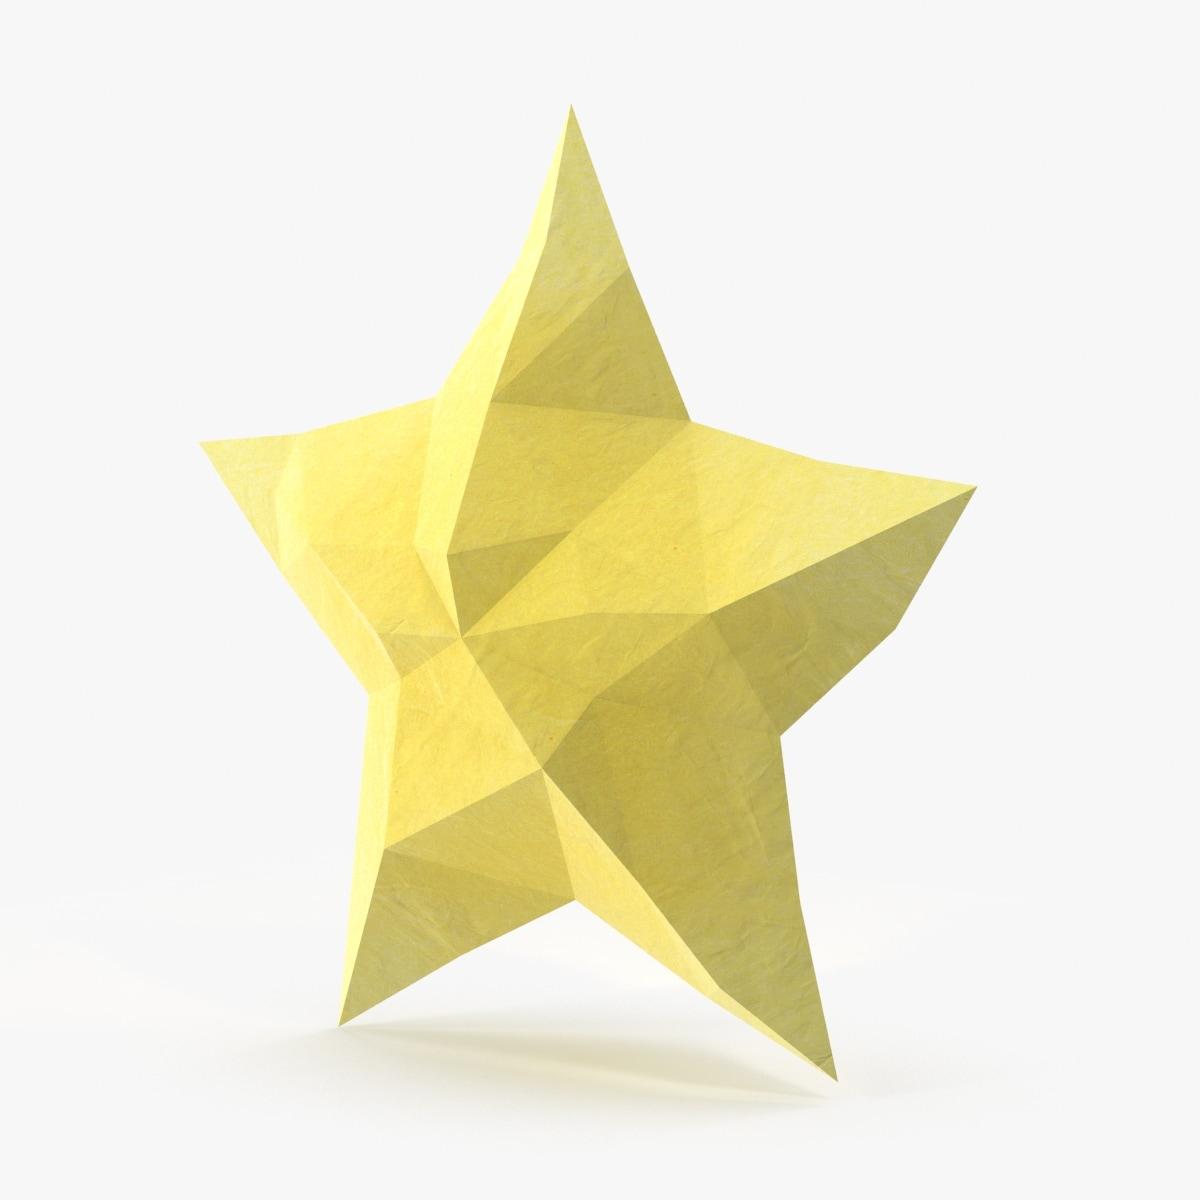 star_01_SQRSignature_0000.jpg